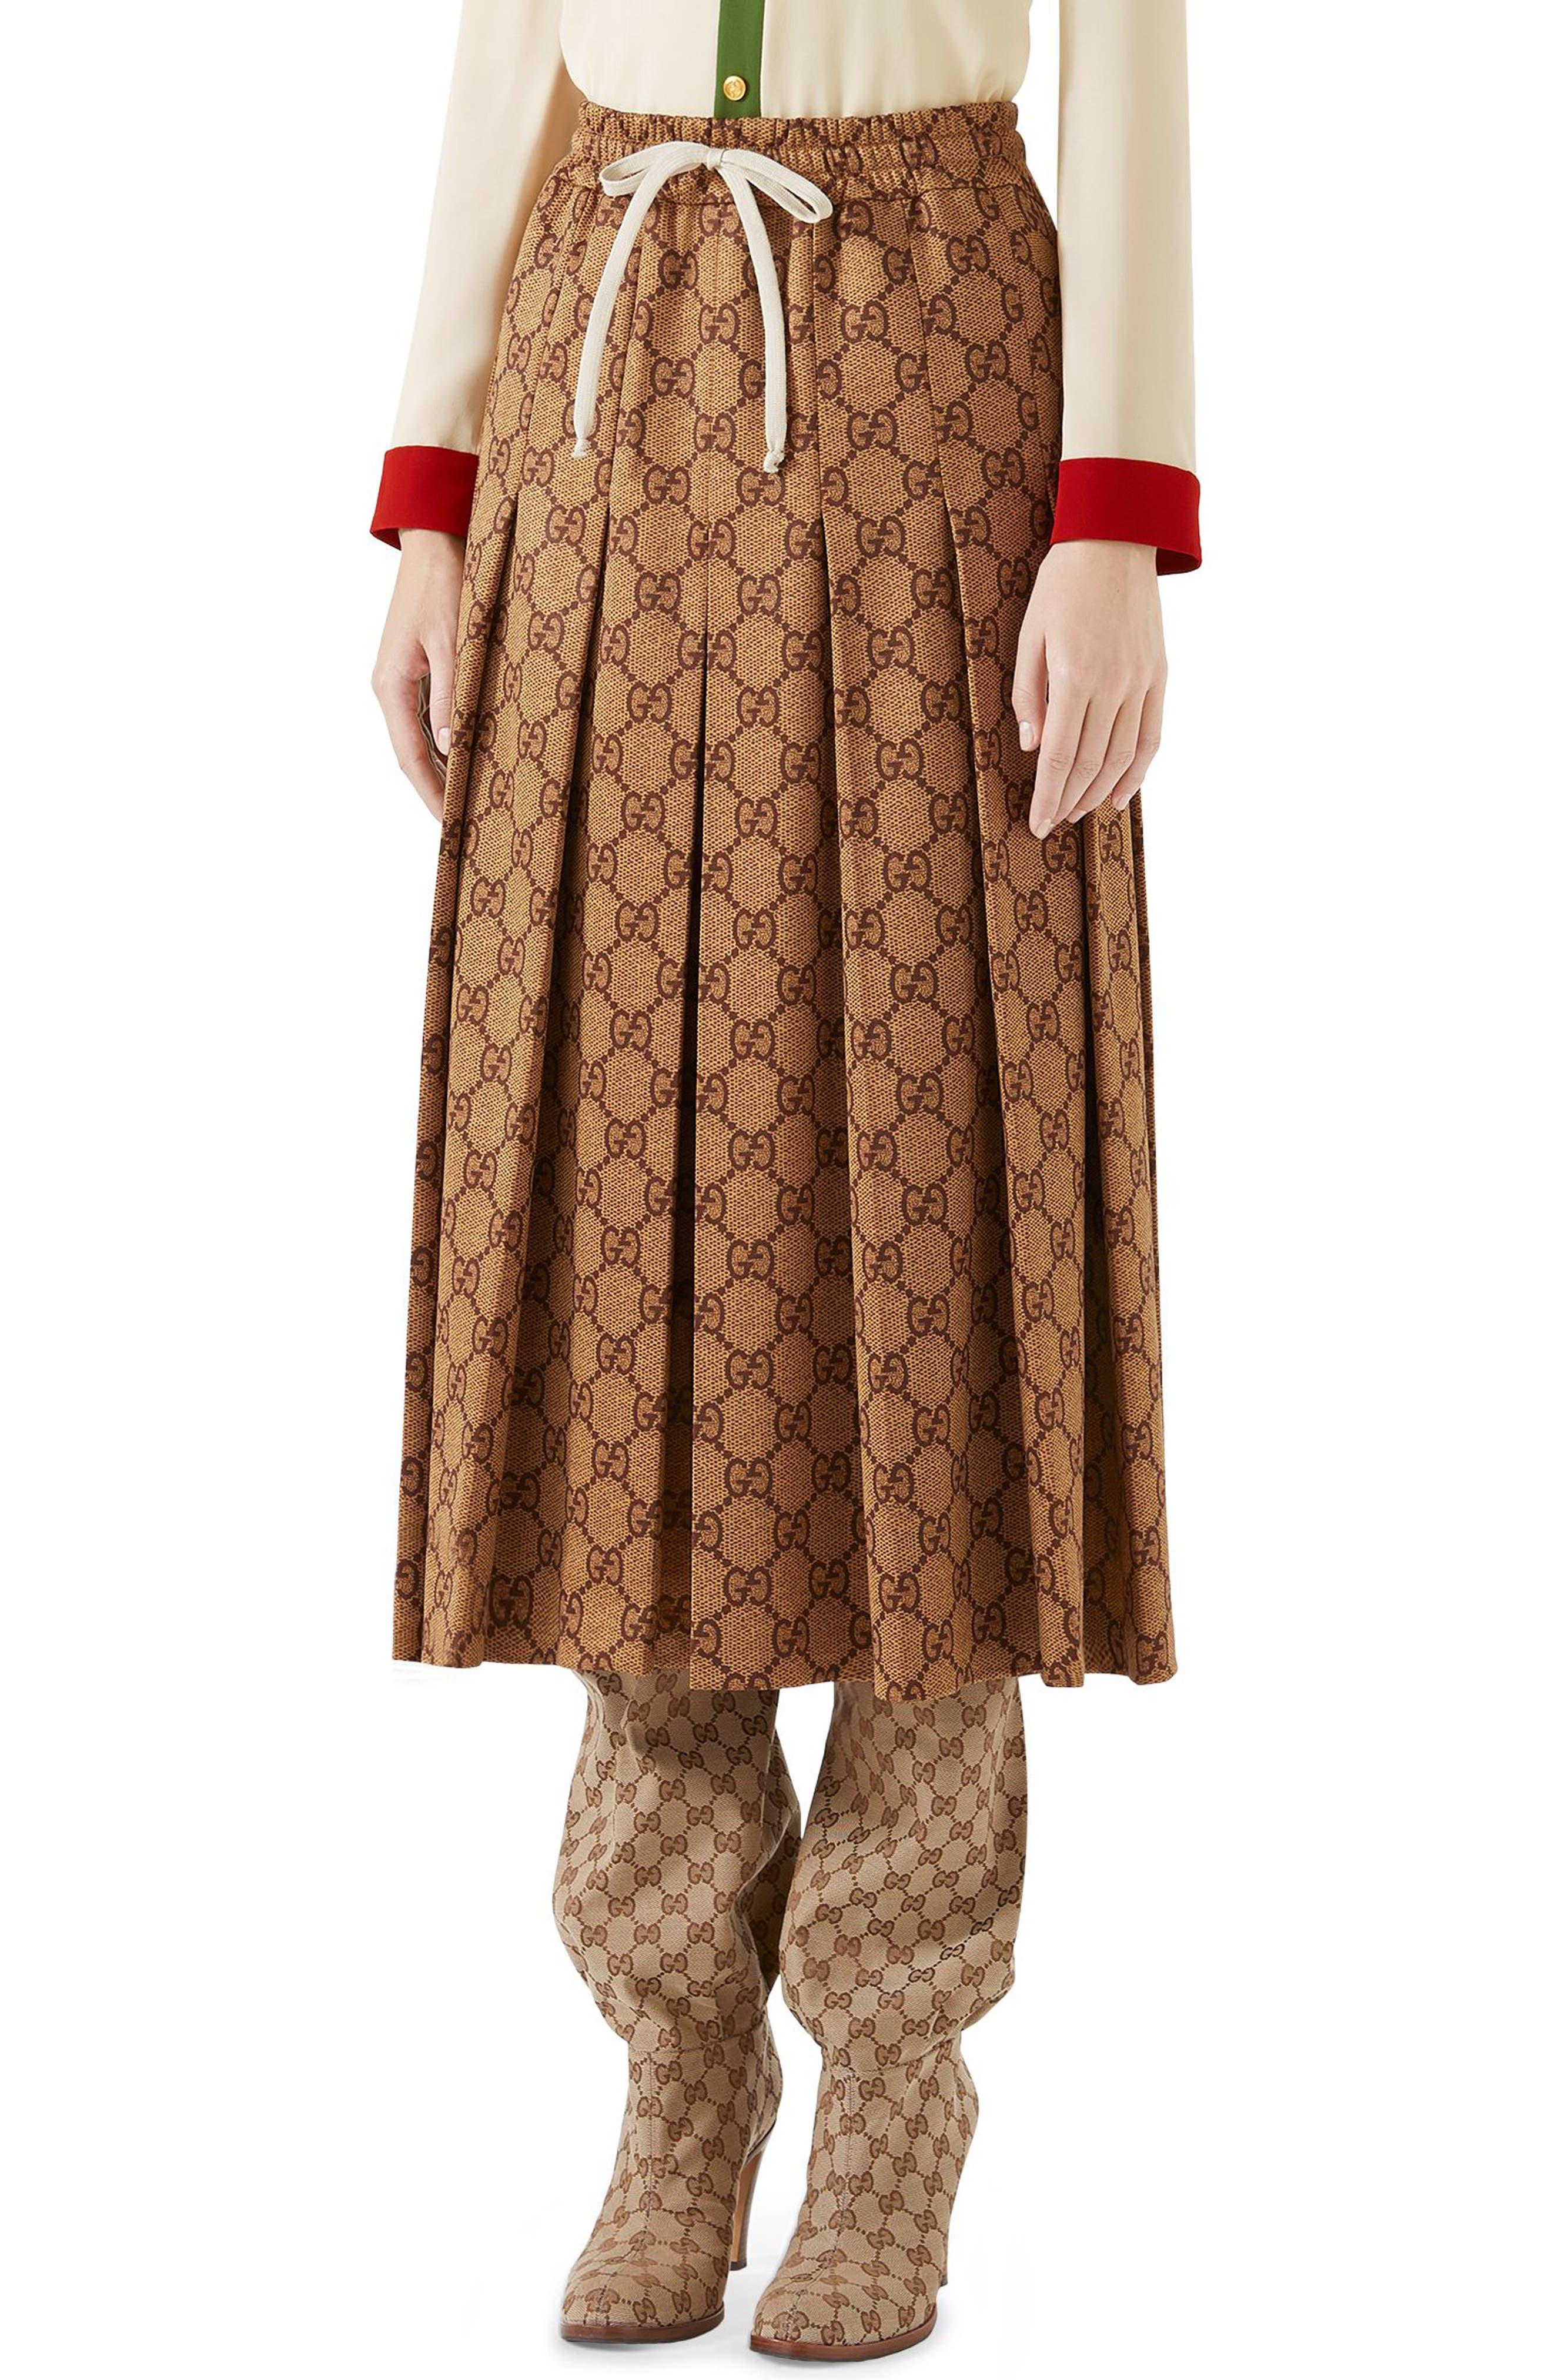 GG Print Pleated Midi Skirt,                         Main,                         color, Vintage Camel